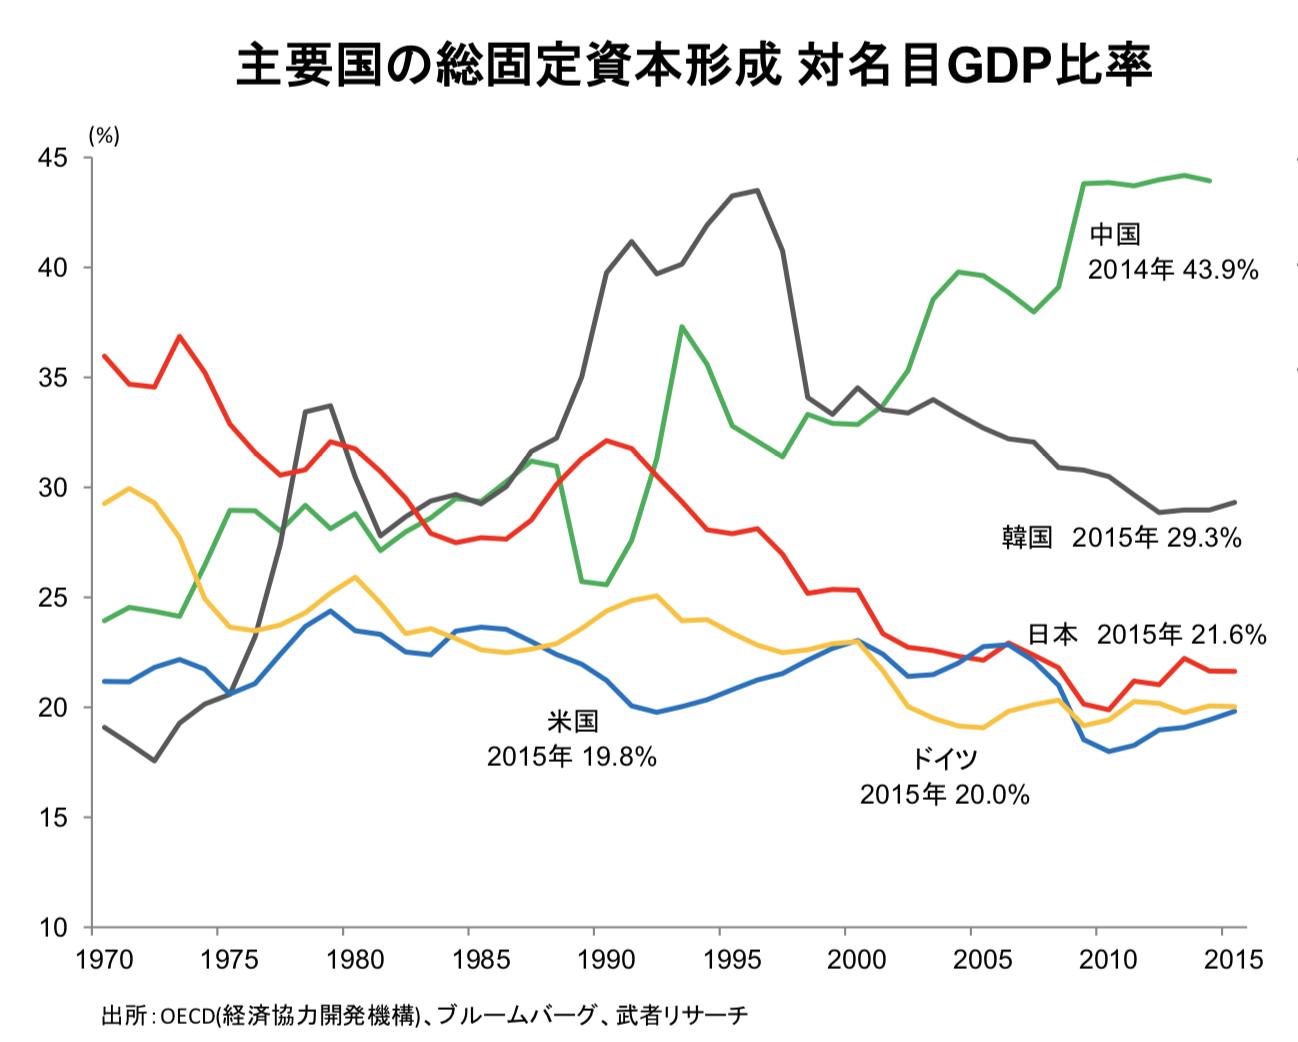 中国の過剰な投資比率